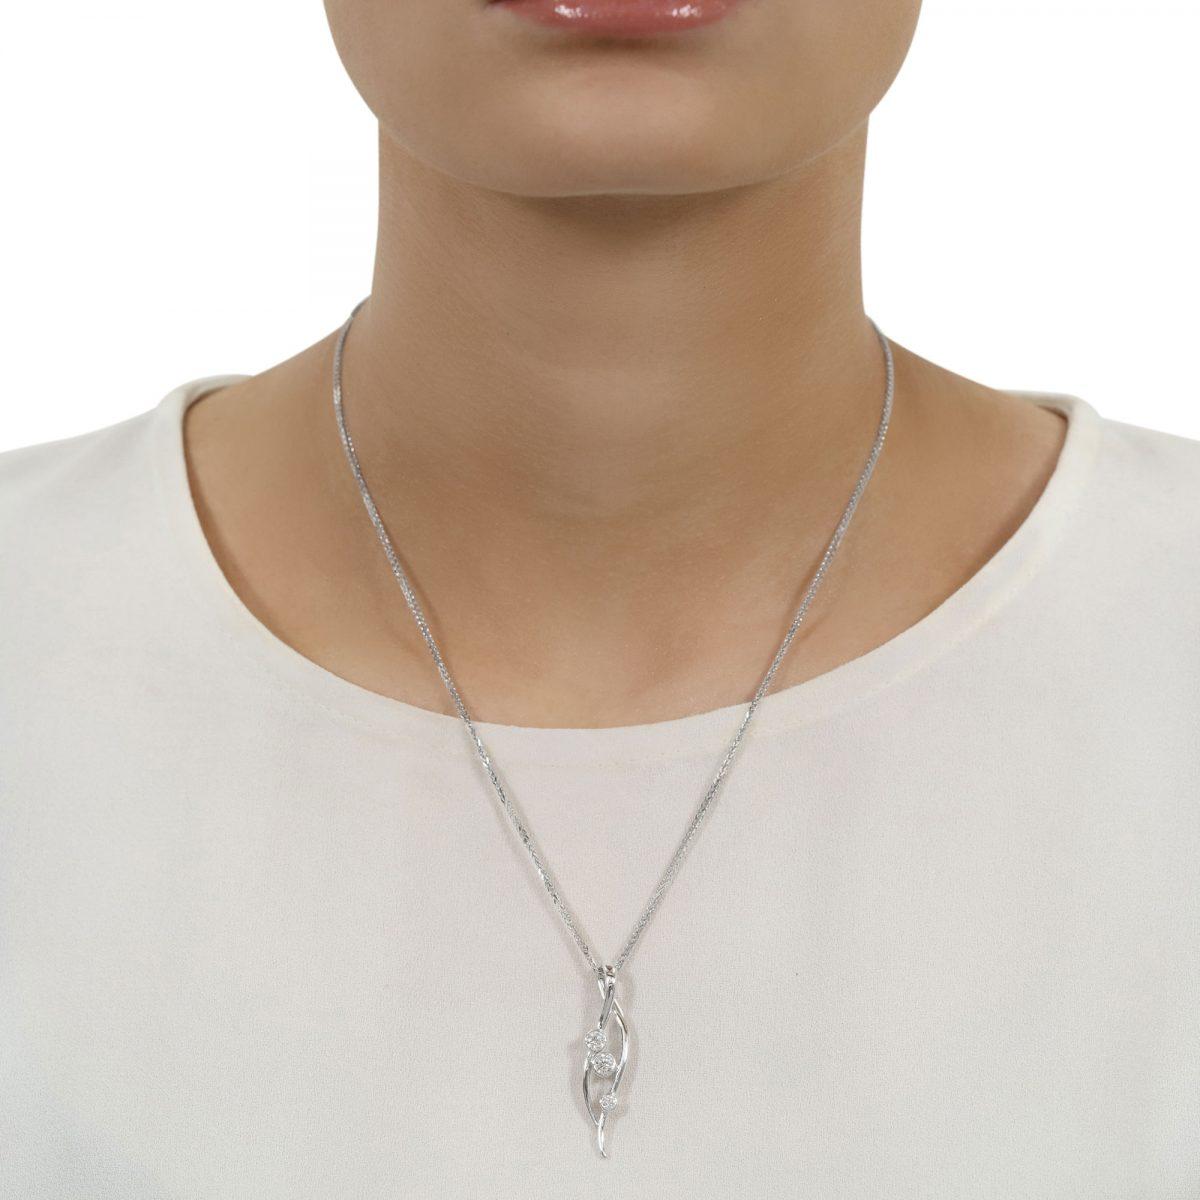 Lunar White Gold Diamond Pendant